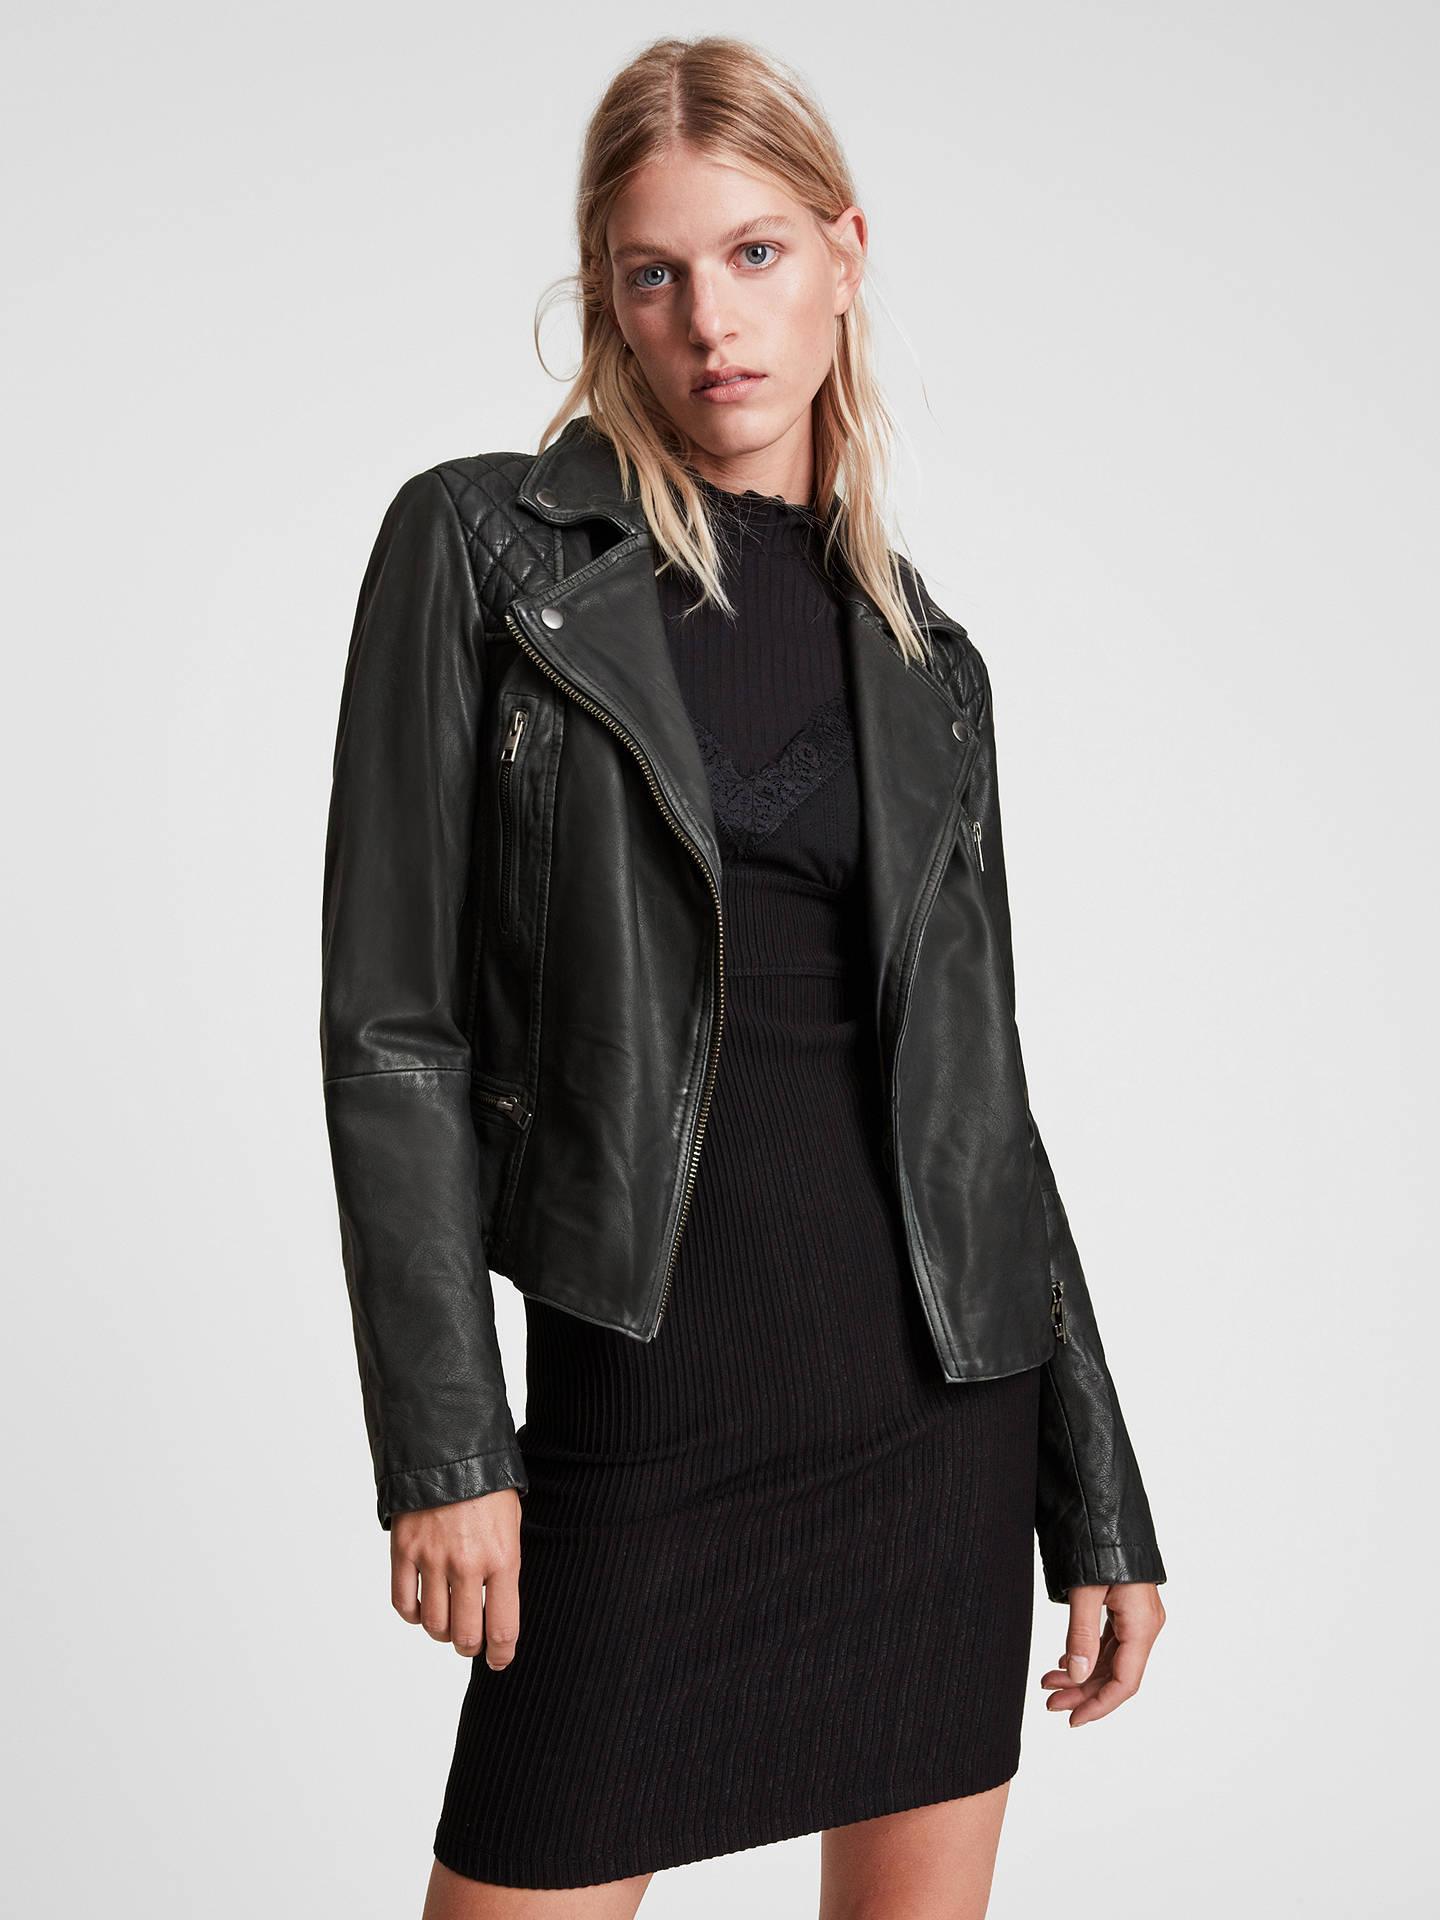 50c0f08a629 AllSaints Leather Cargo Biker Jacket, Black/Grey